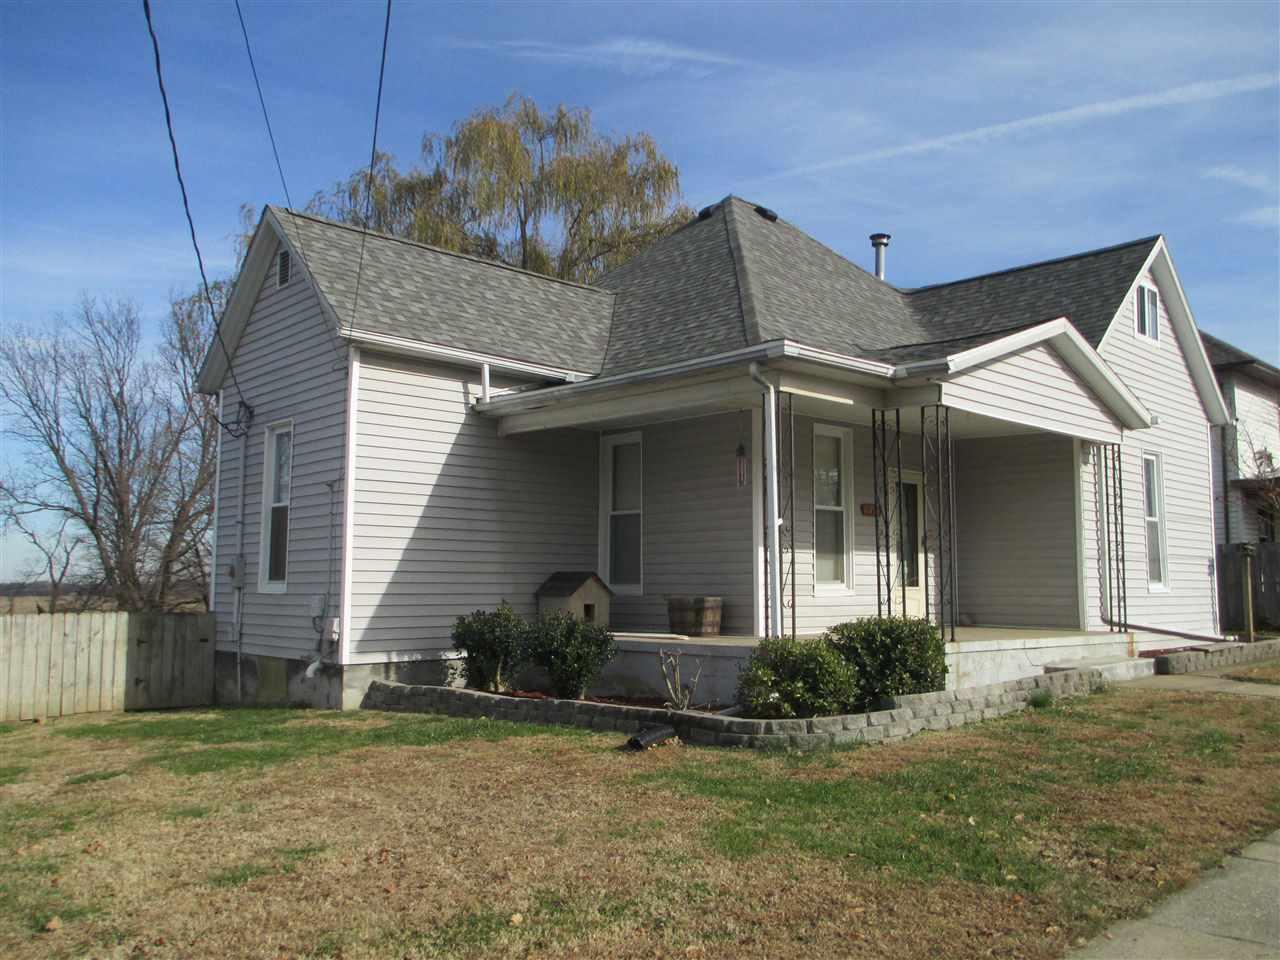 10700  North St, Cynthiana, IN 47612